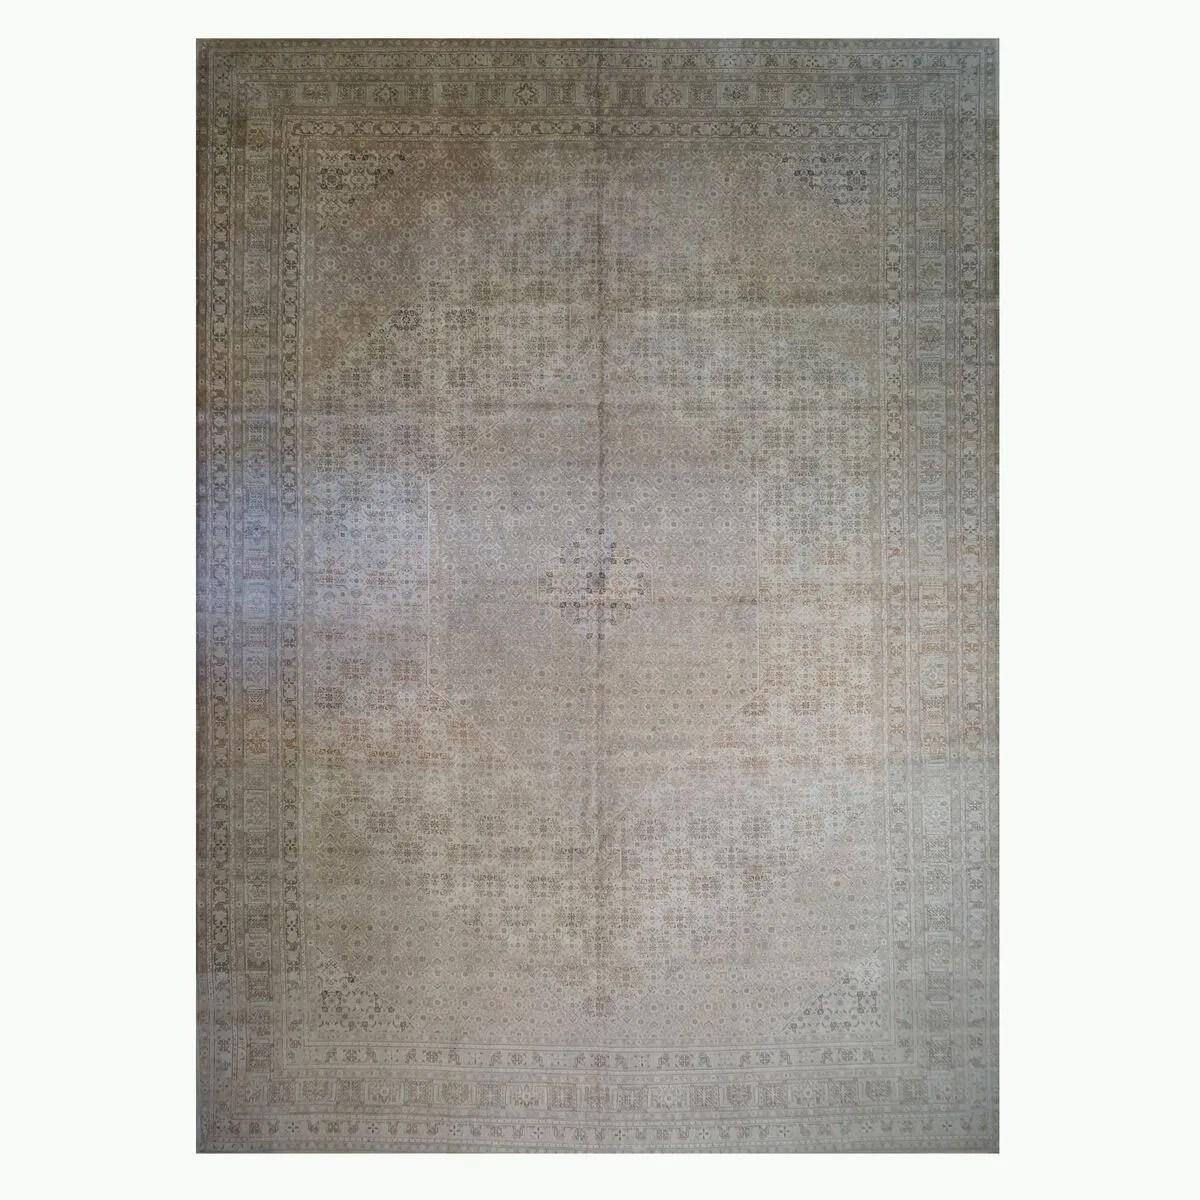 1142928 Antique Tabriz by Ashly Fine Rugs